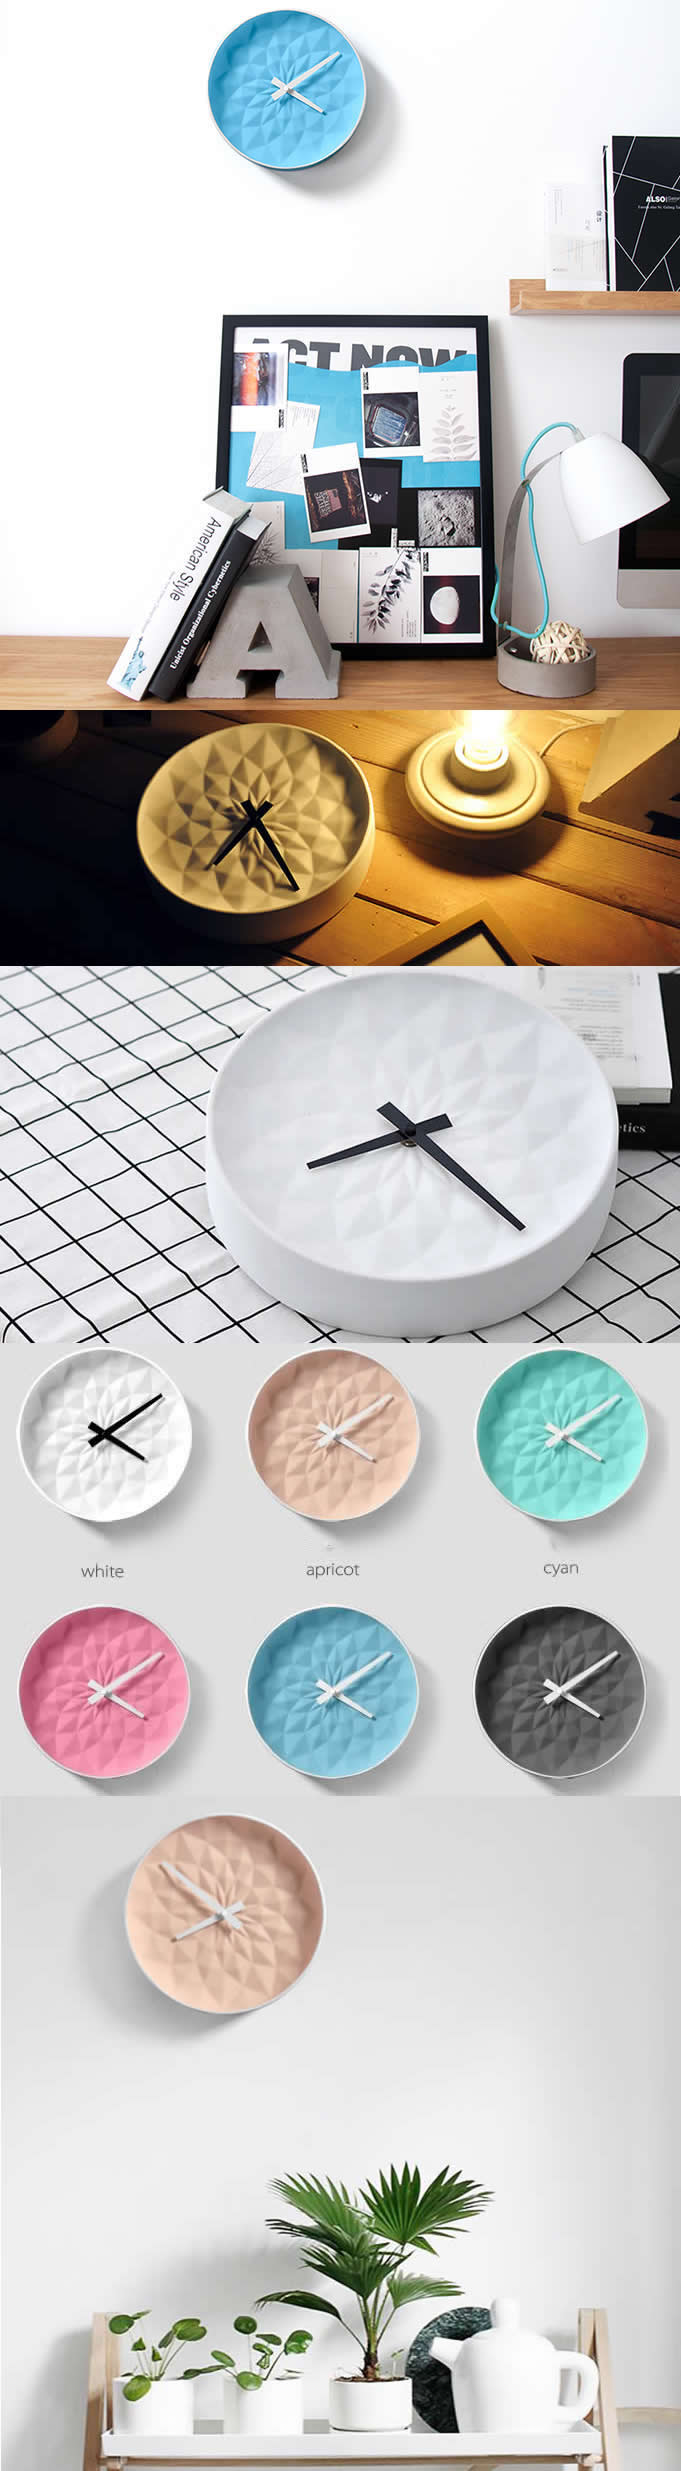 Ceramic Clockhandmade Ceramic Wall Clock In An Art Deco Style